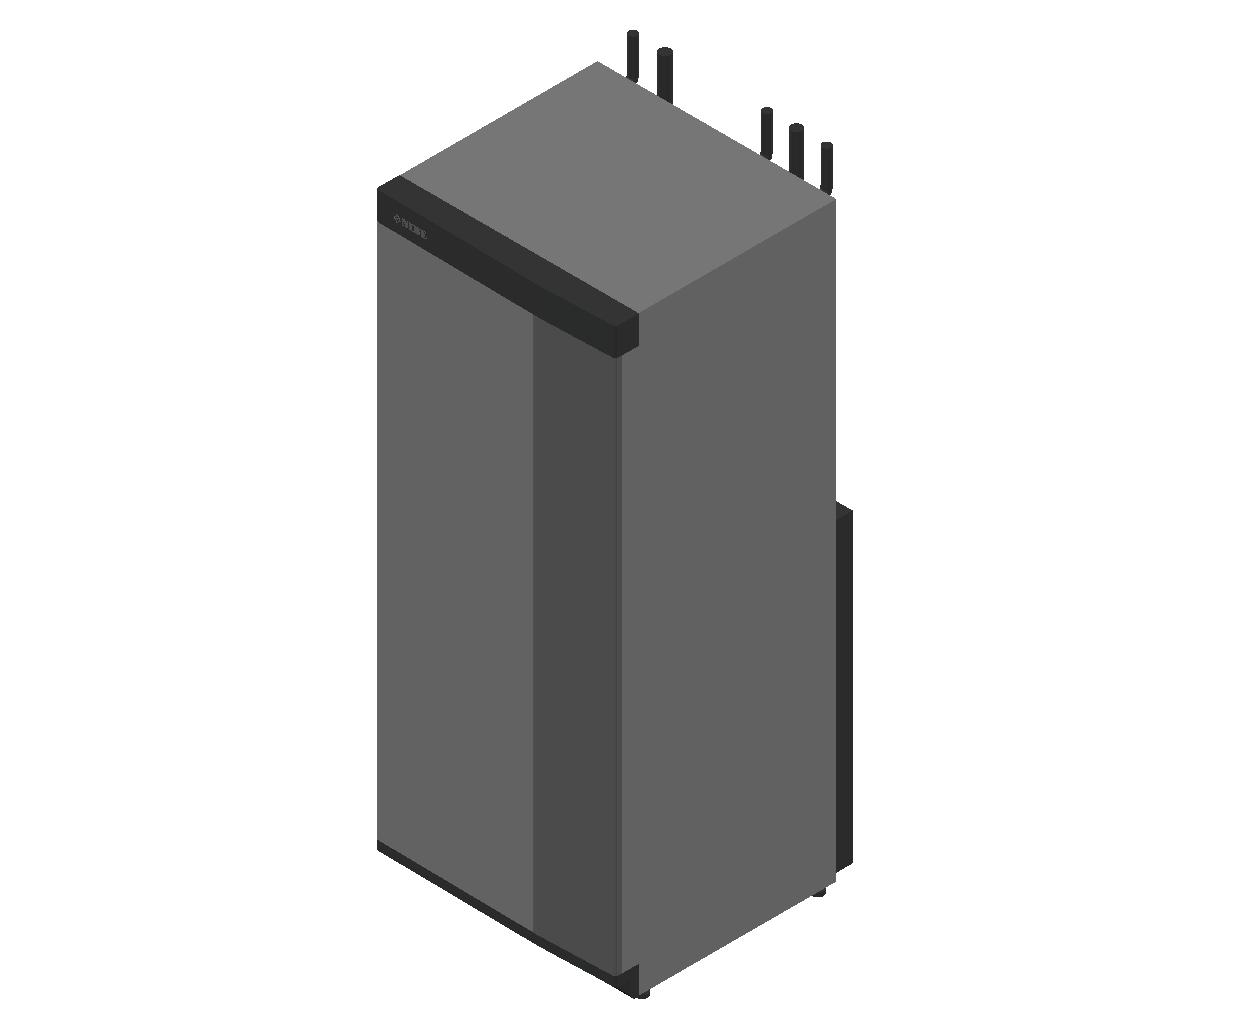 HC_Heat Pump_MEPcontent_NIBE_S1155-6 3x400V_INT-EN.dwg